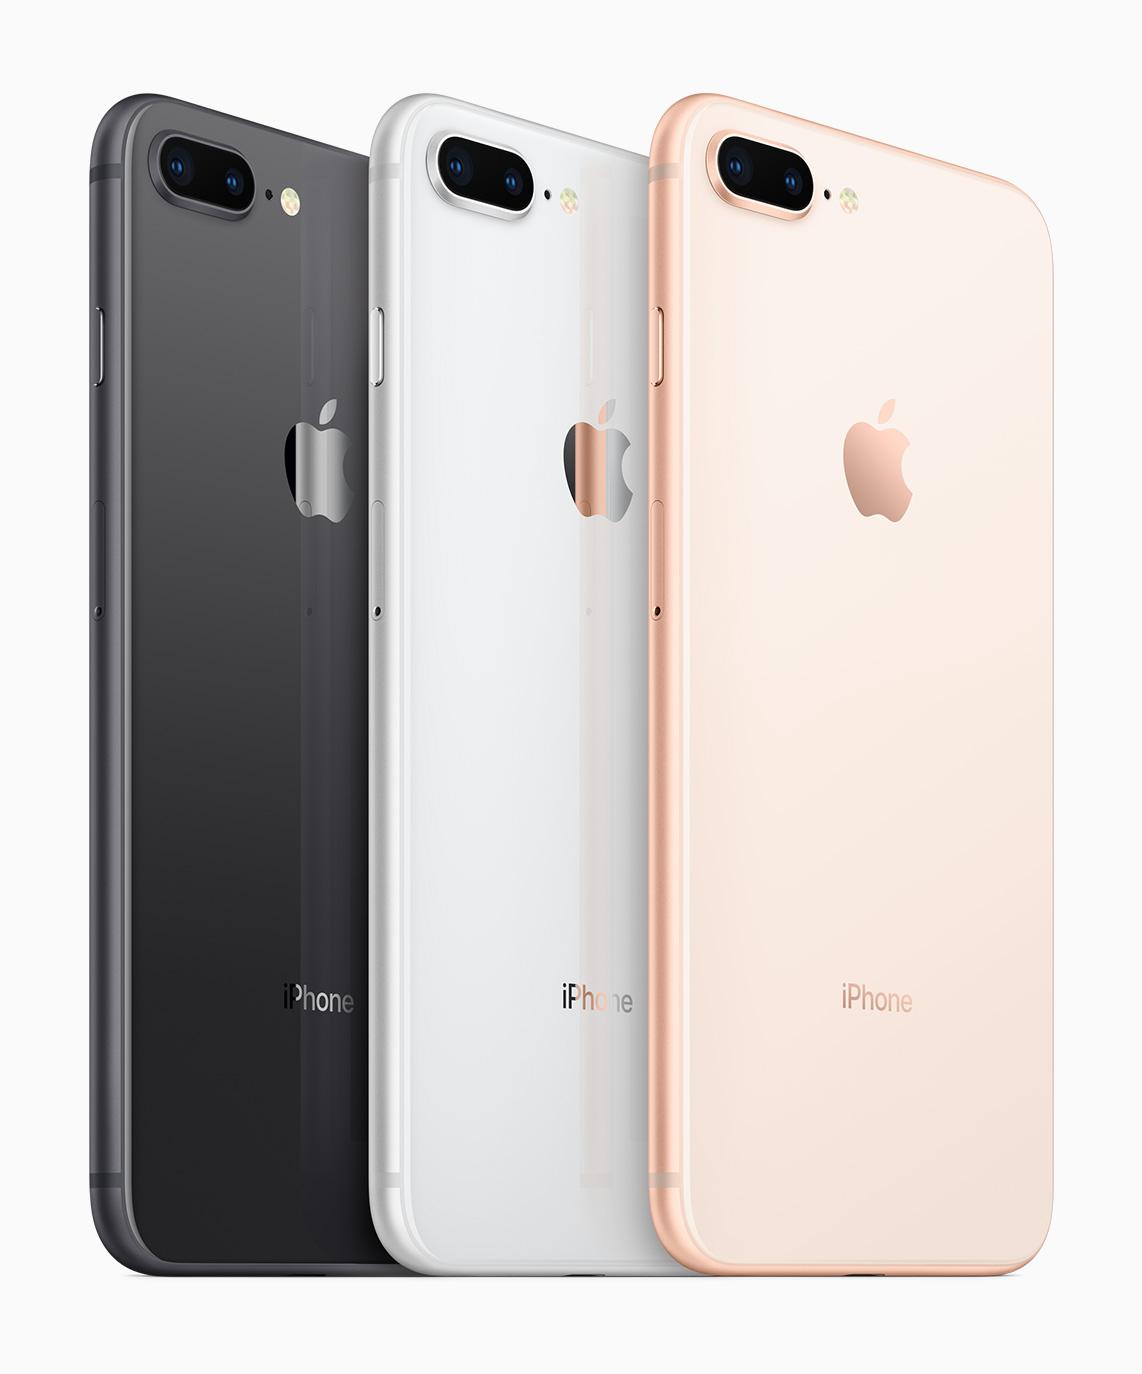 گوشی موبایل آیفون 8 پلاس (iphone 8 plus)